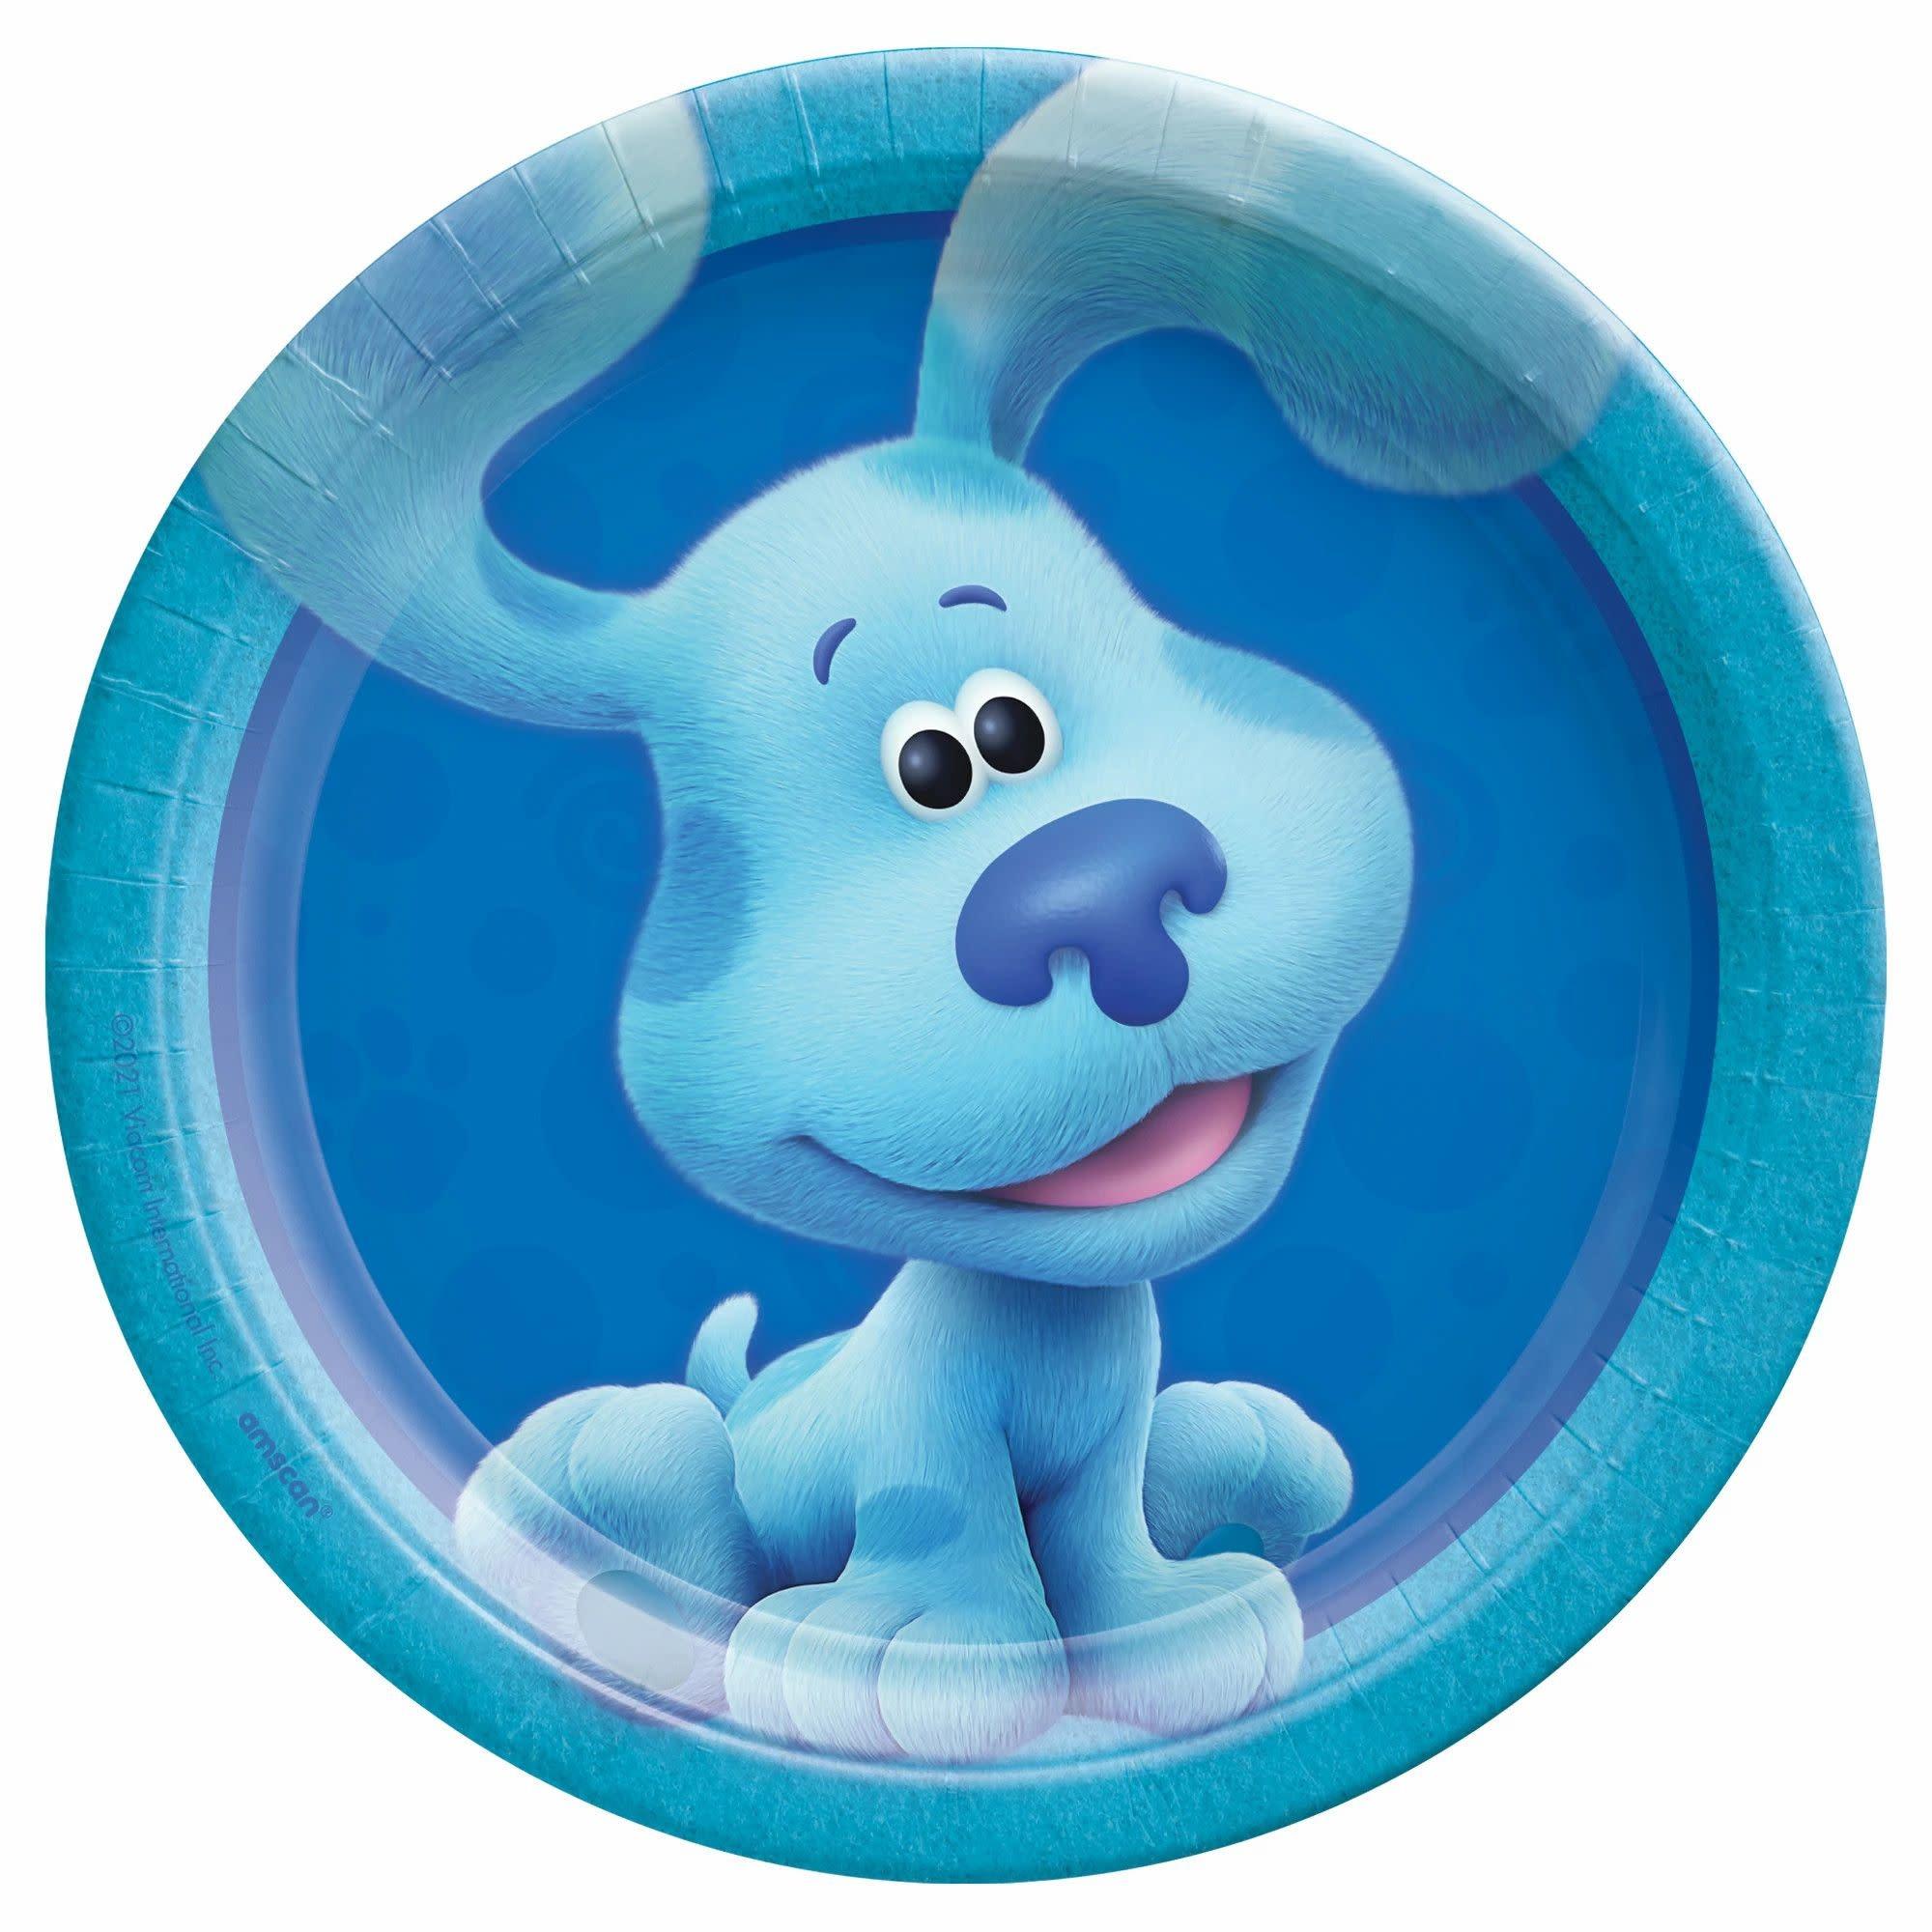 "Blues Clues 7"" Round Plates - Blue"